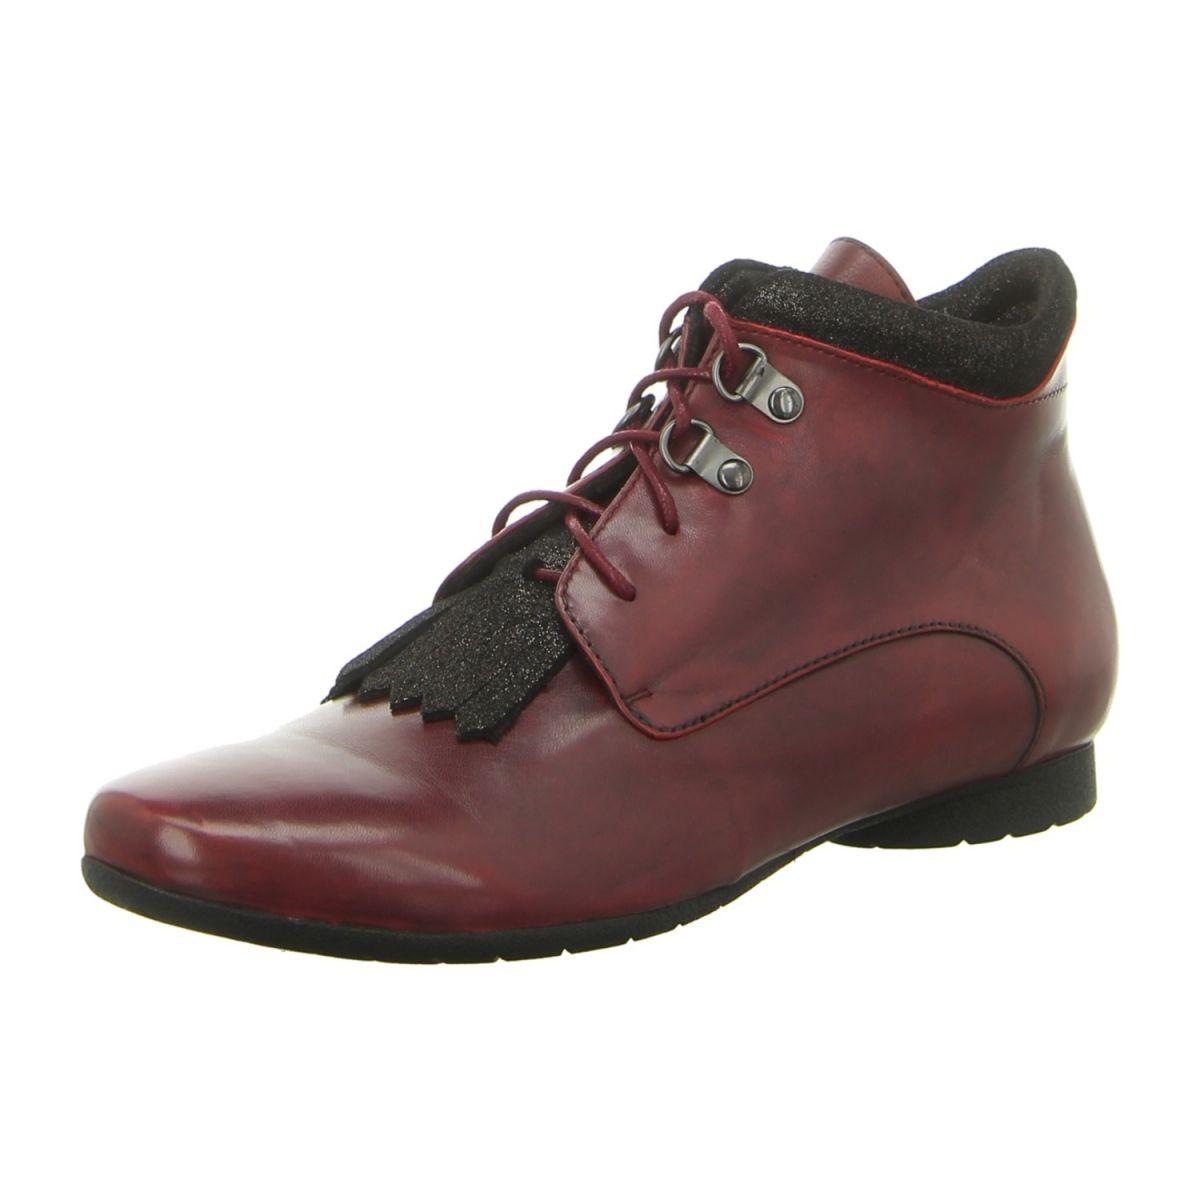 Piazza schwarz Schuhe Stiefelette 991079 1 schwarz Piazza asphalt (schwarz) NEU 14824c